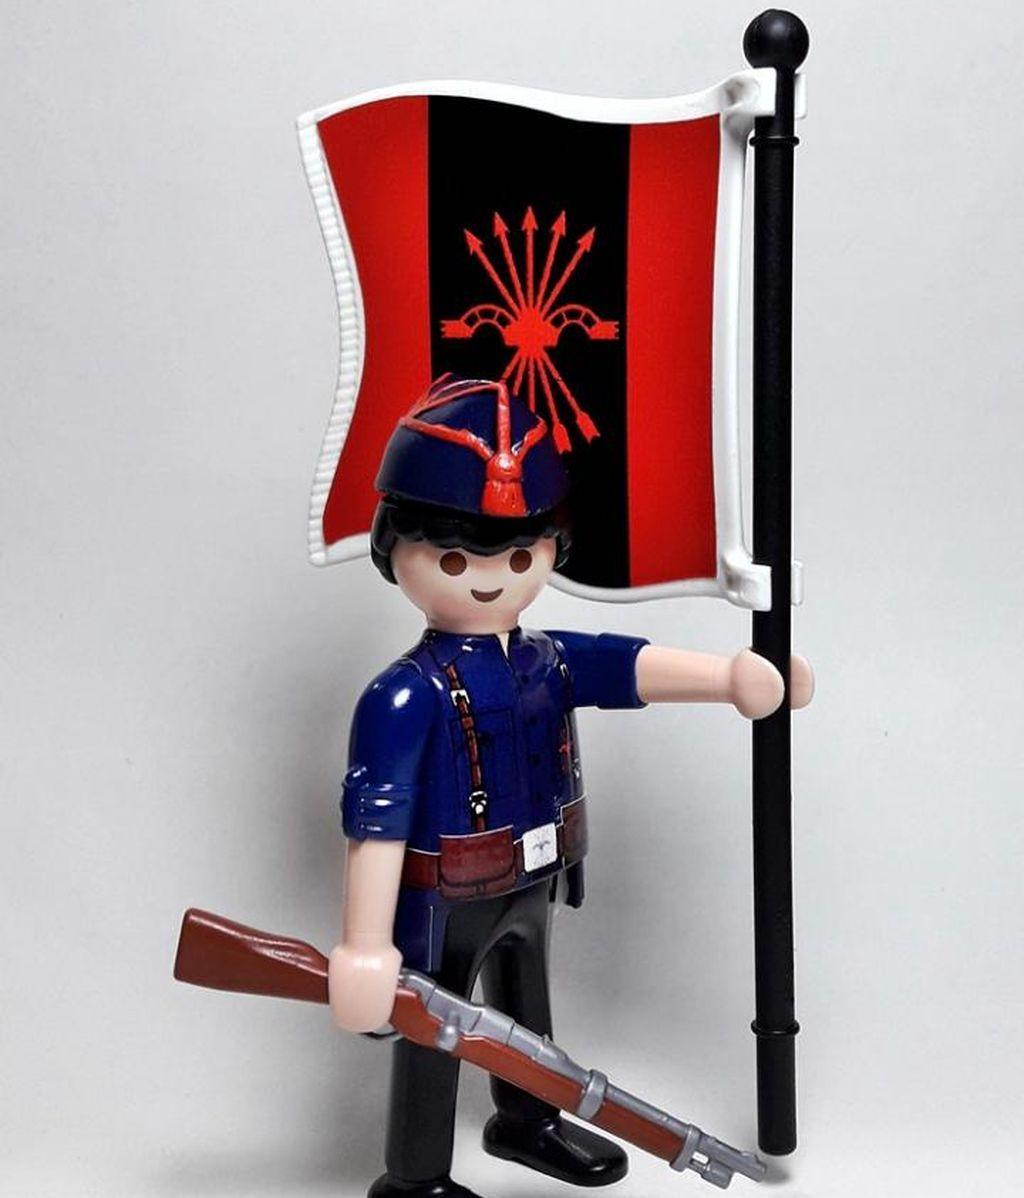 No te quedes sin jugar a salvar España con tu Playmobil falangista